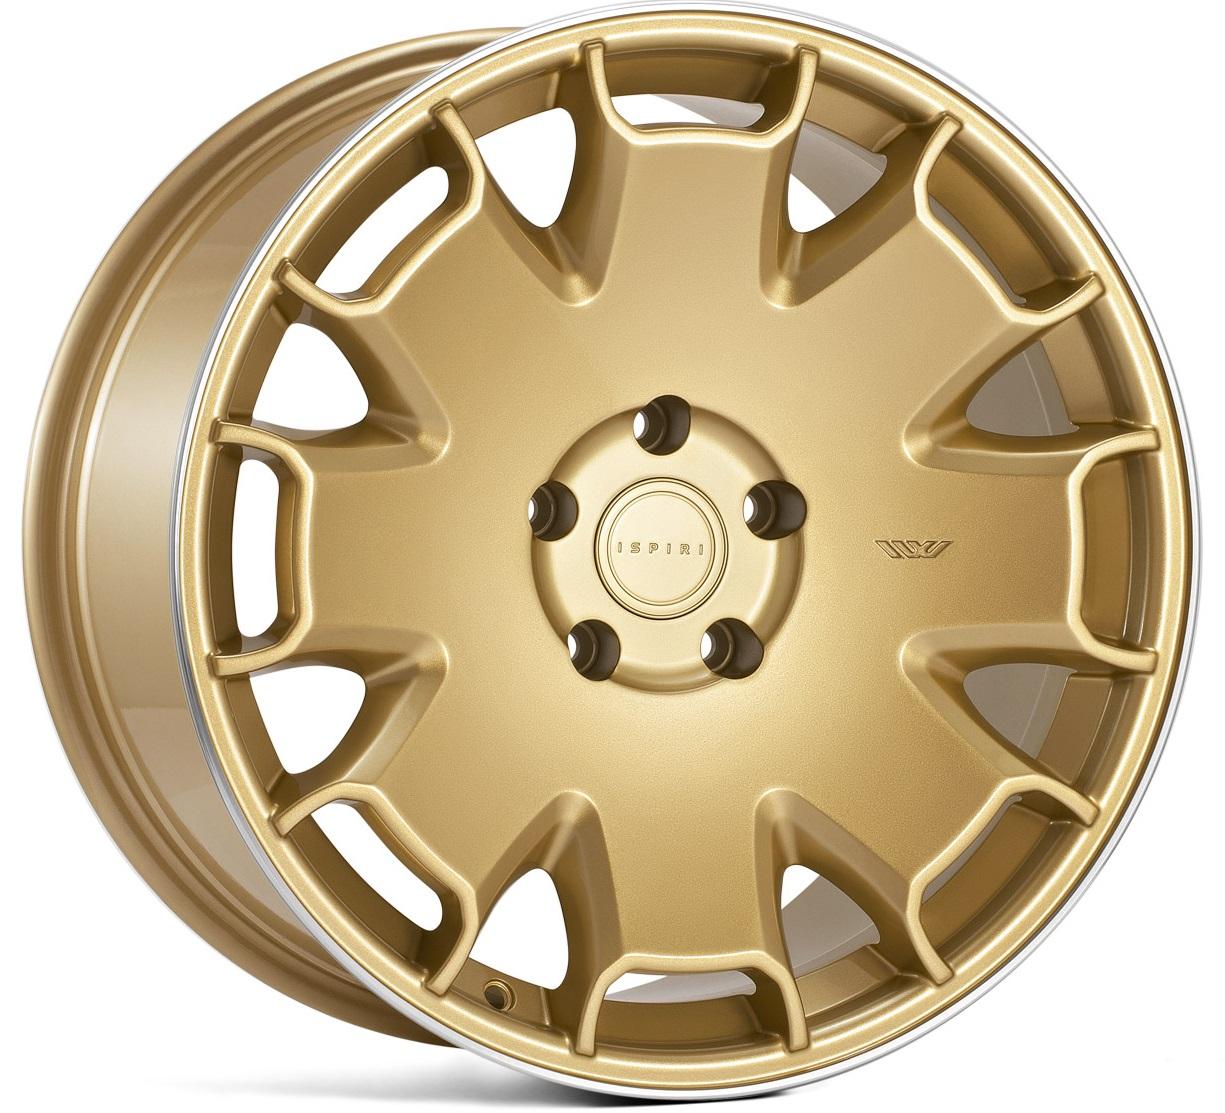 IW Automotive - CSR2 (Vintage Gold Polished Lip)